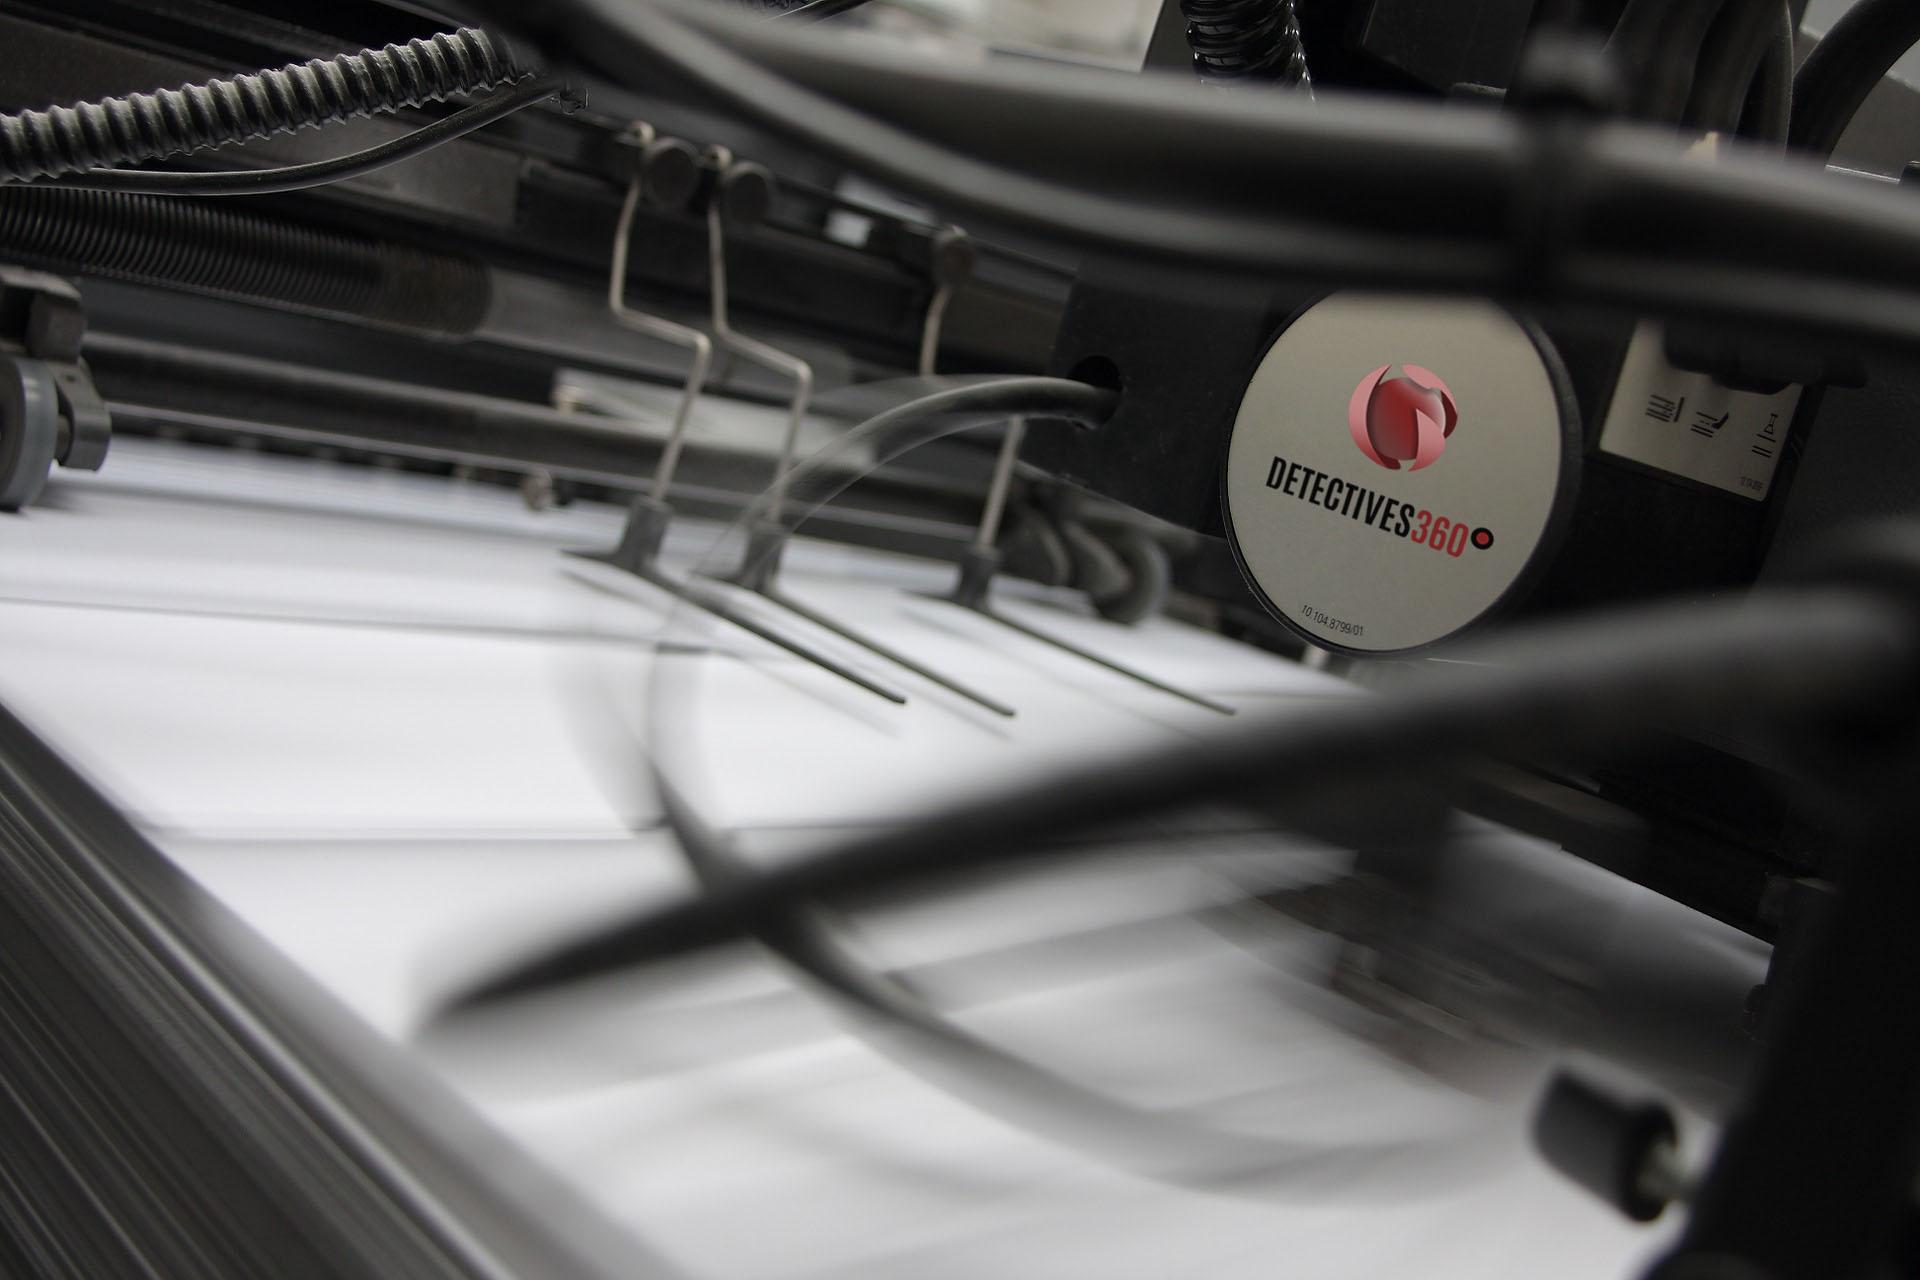 maquina-poligrafo-det-360